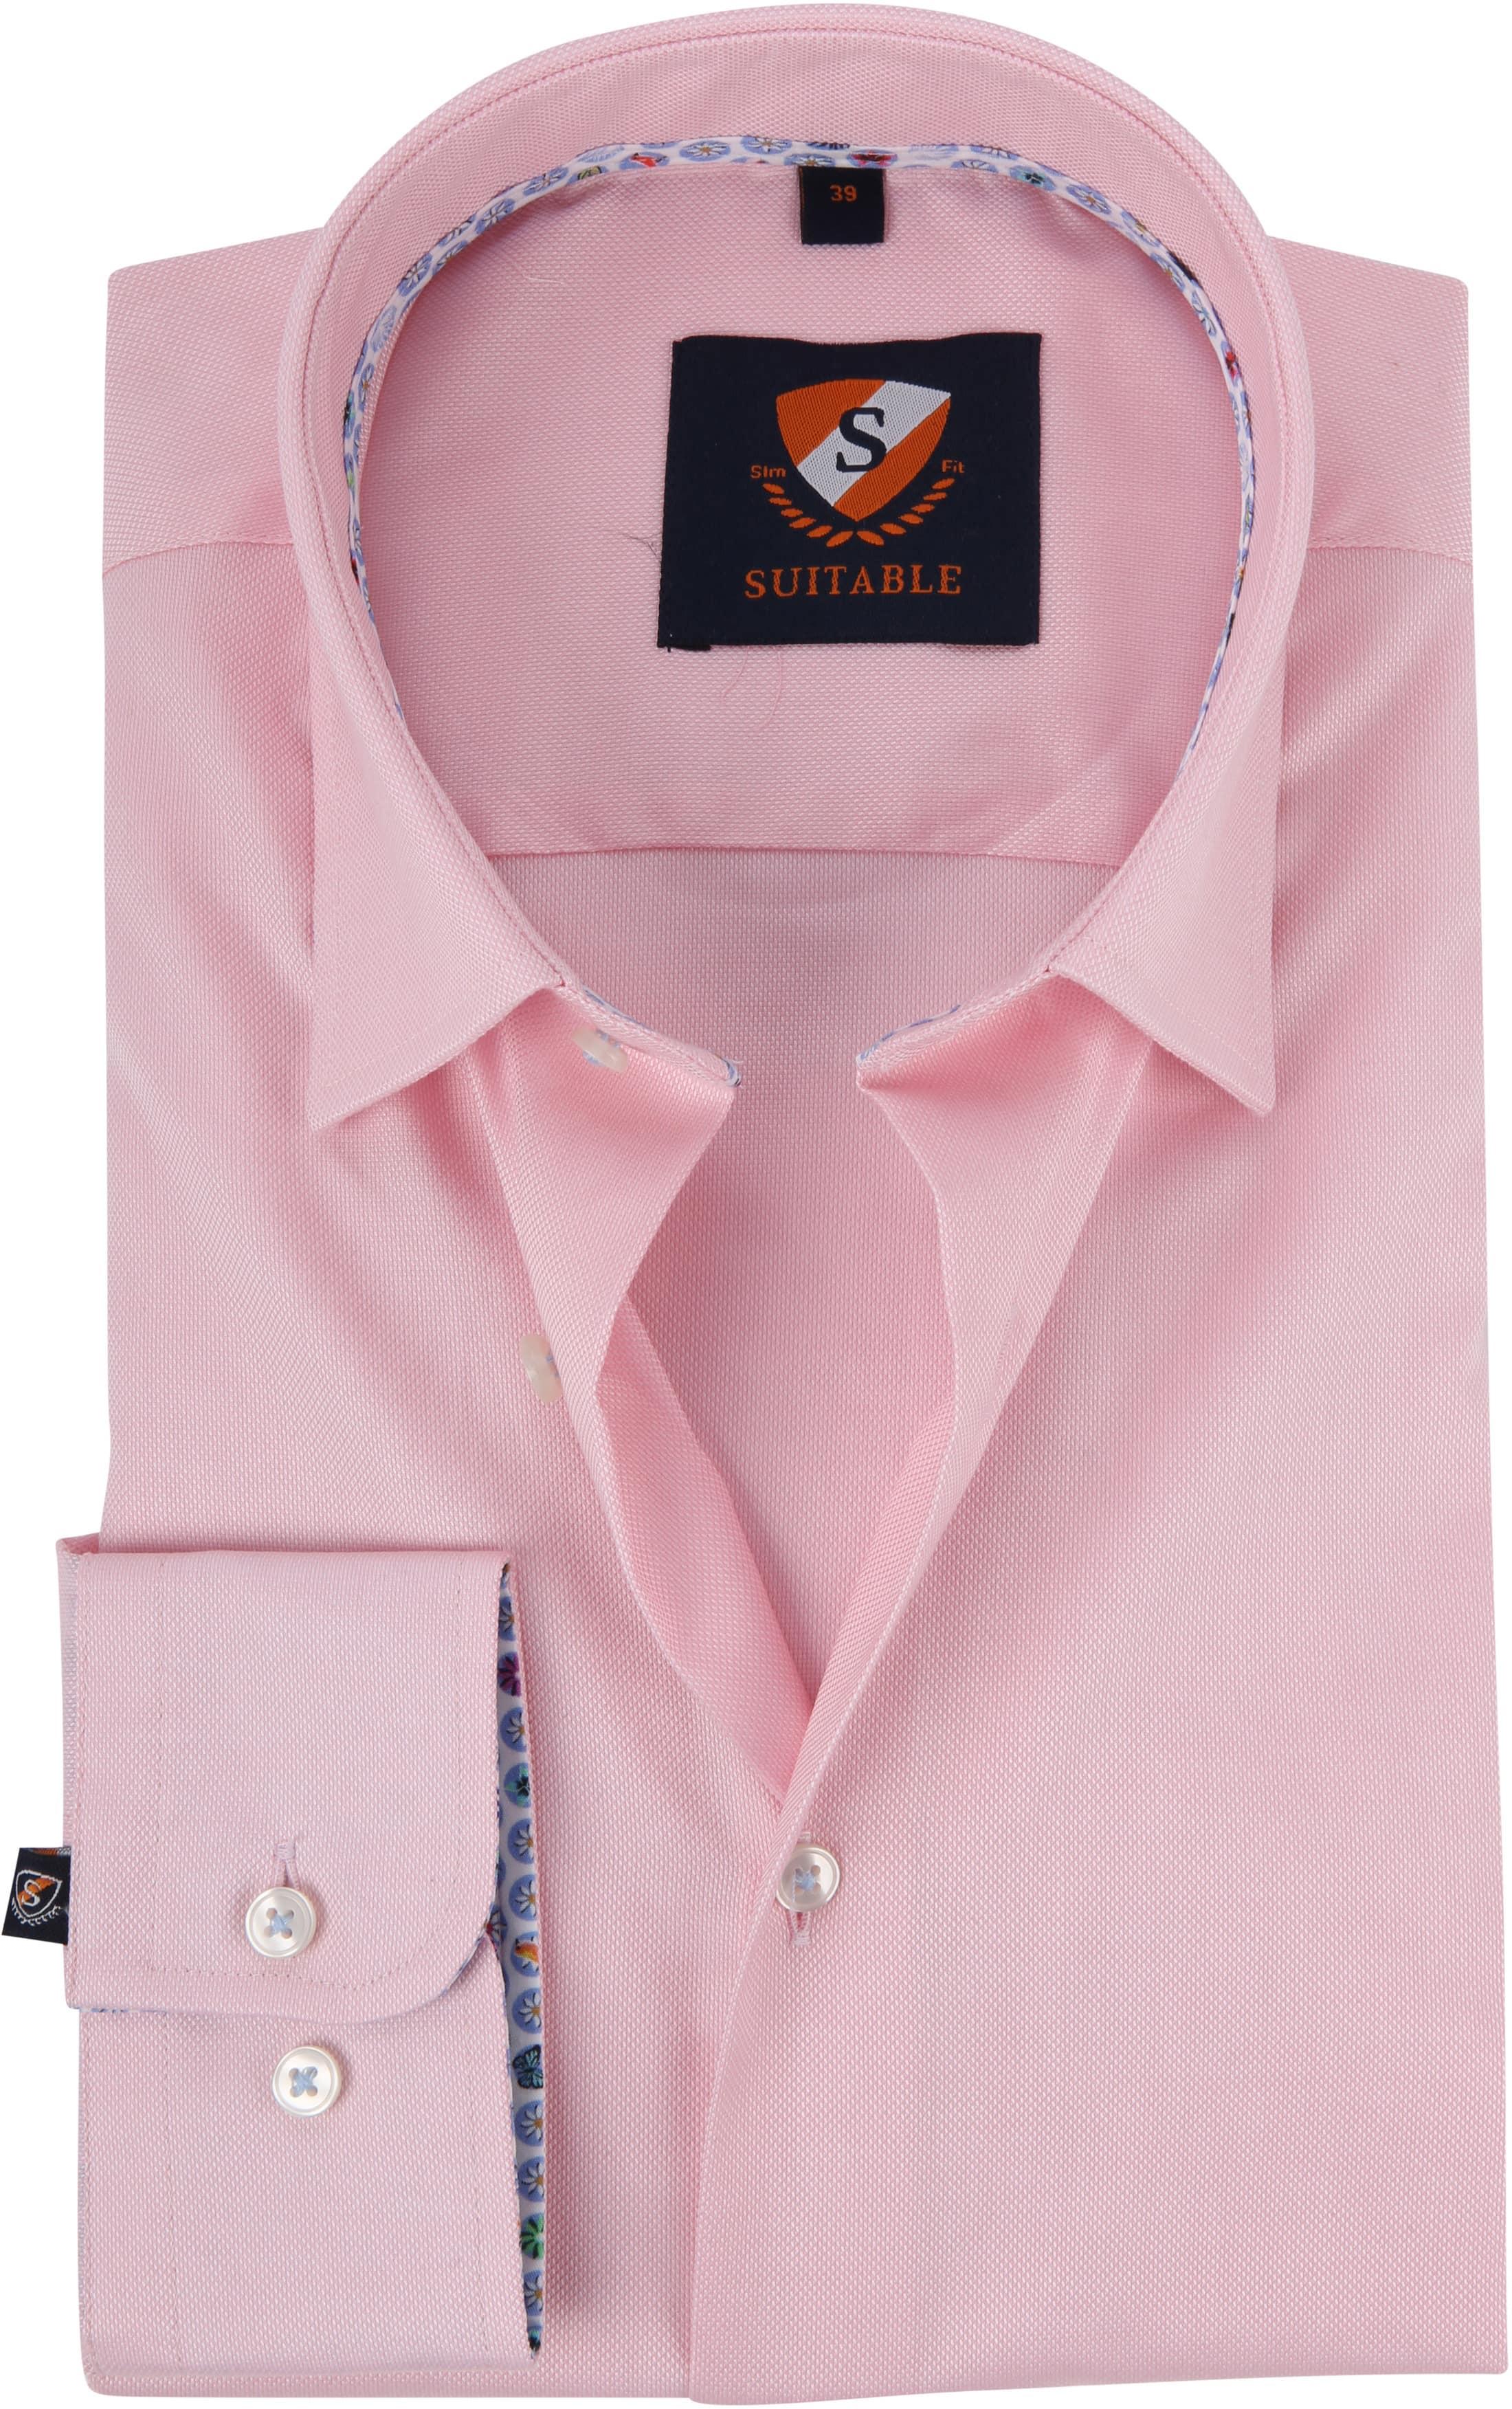 Suitable Shirt HBD Pink foto 0